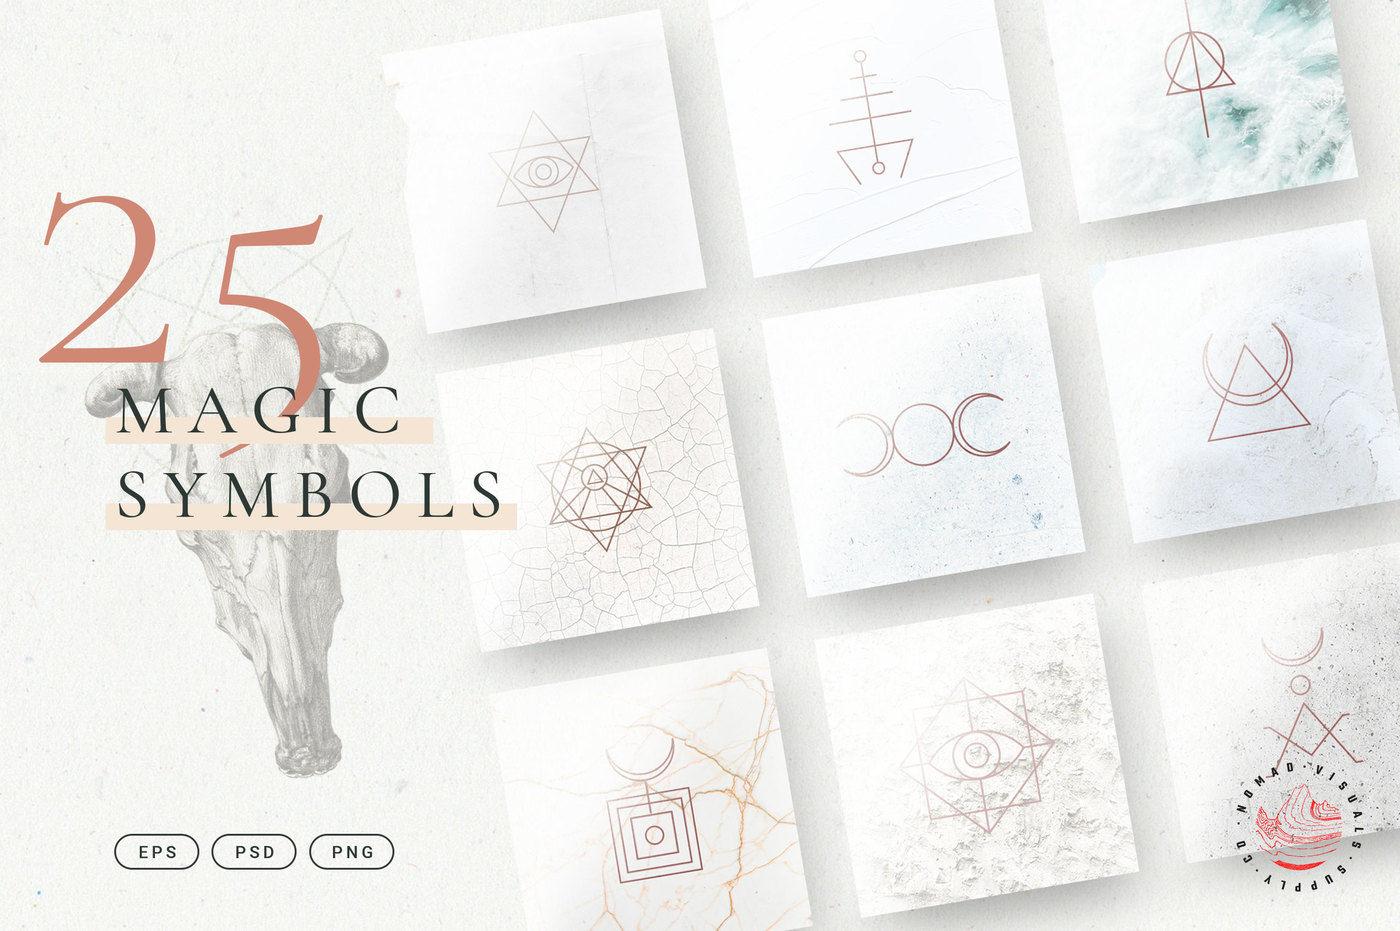 Minimalistic Magic Symbols - Occult Shapes By Nomad Visuals